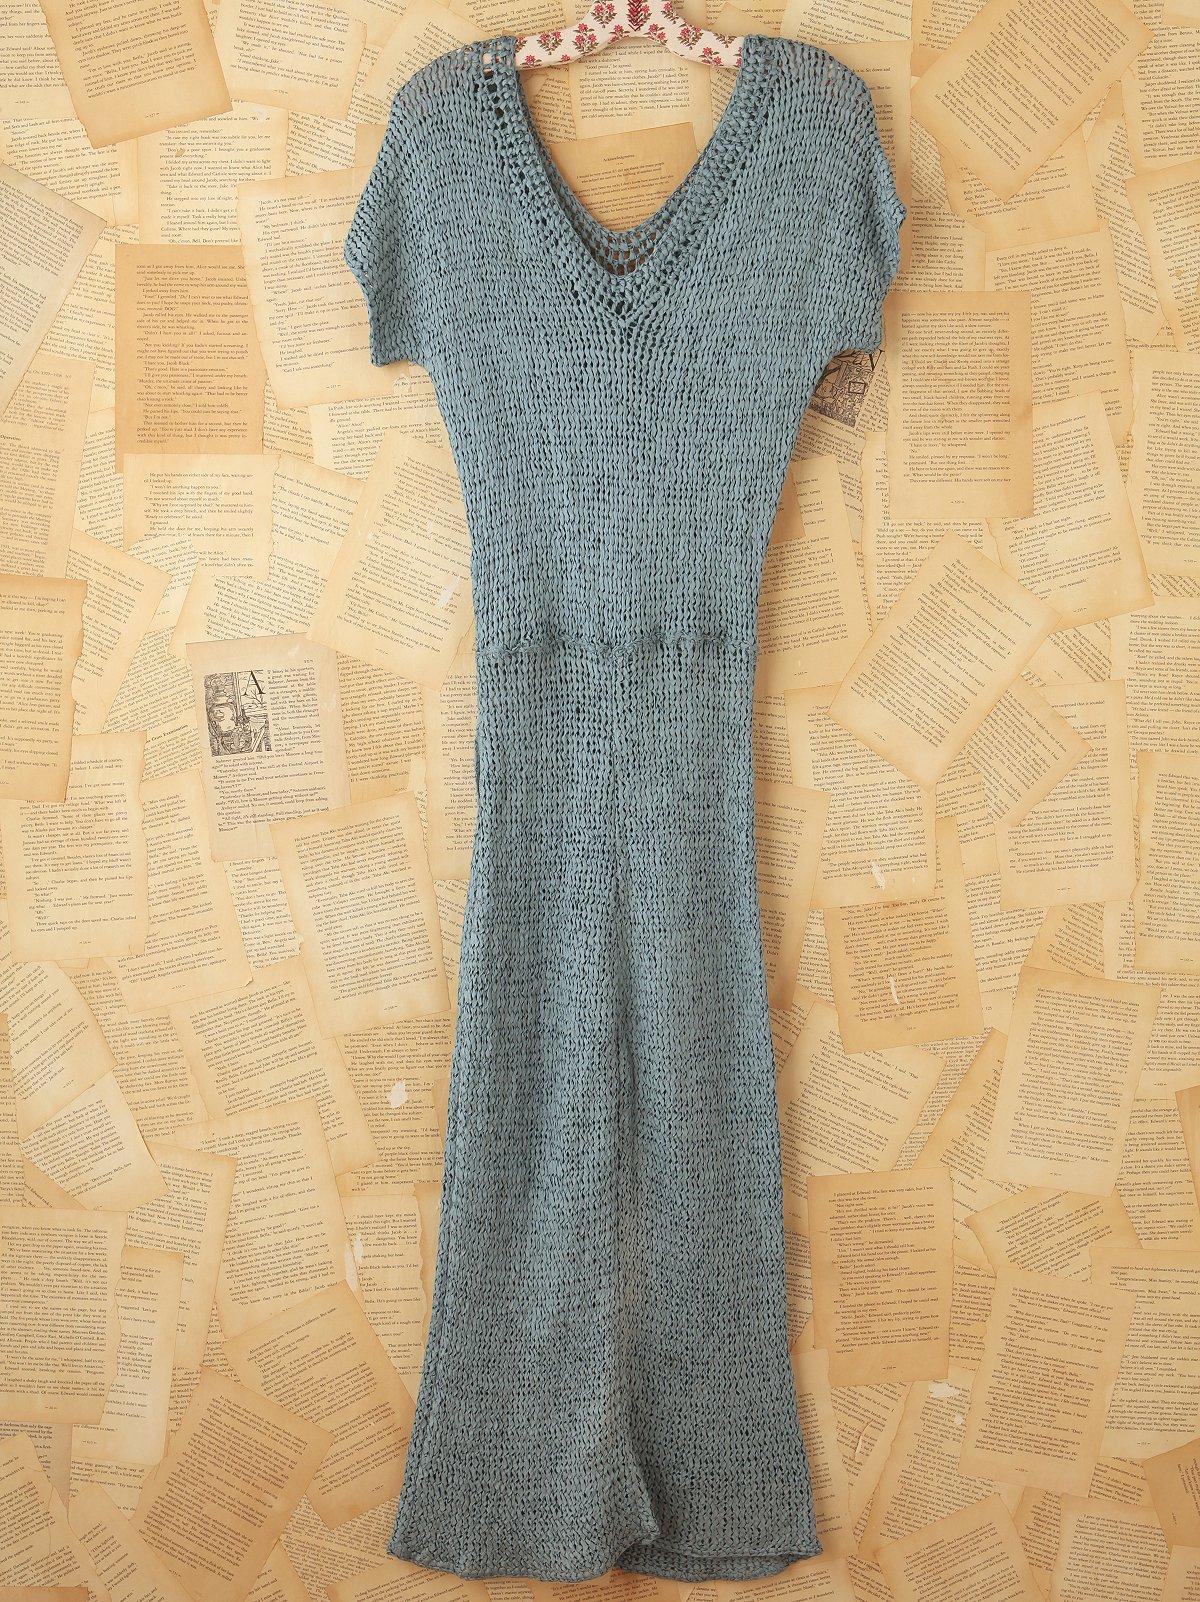 Vintage Ribbon Dress